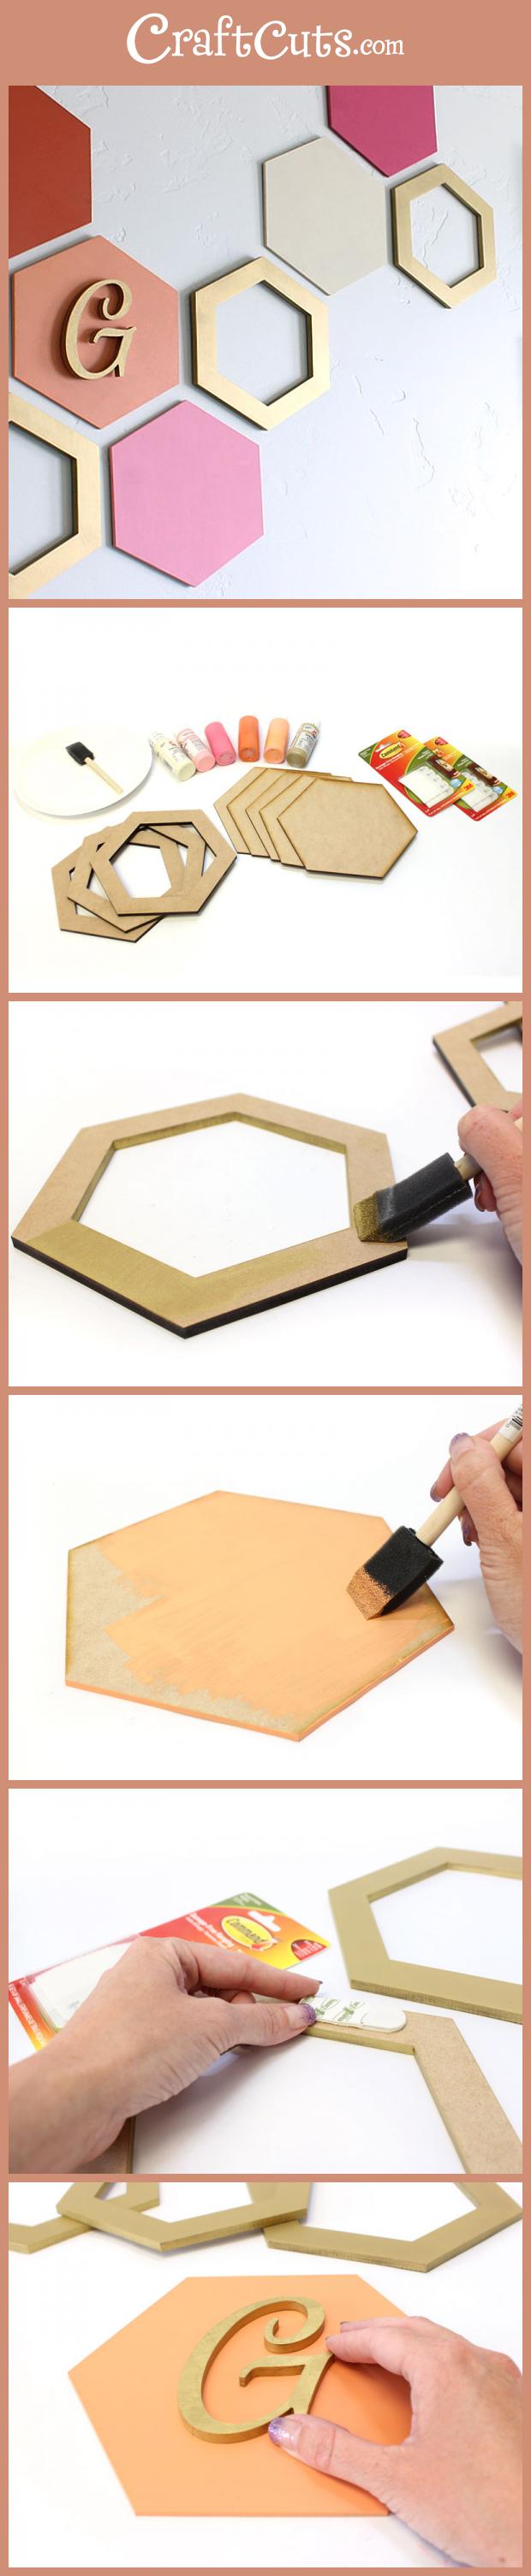 Simple hexagon wall art geometric wood shapes craftcuts diy